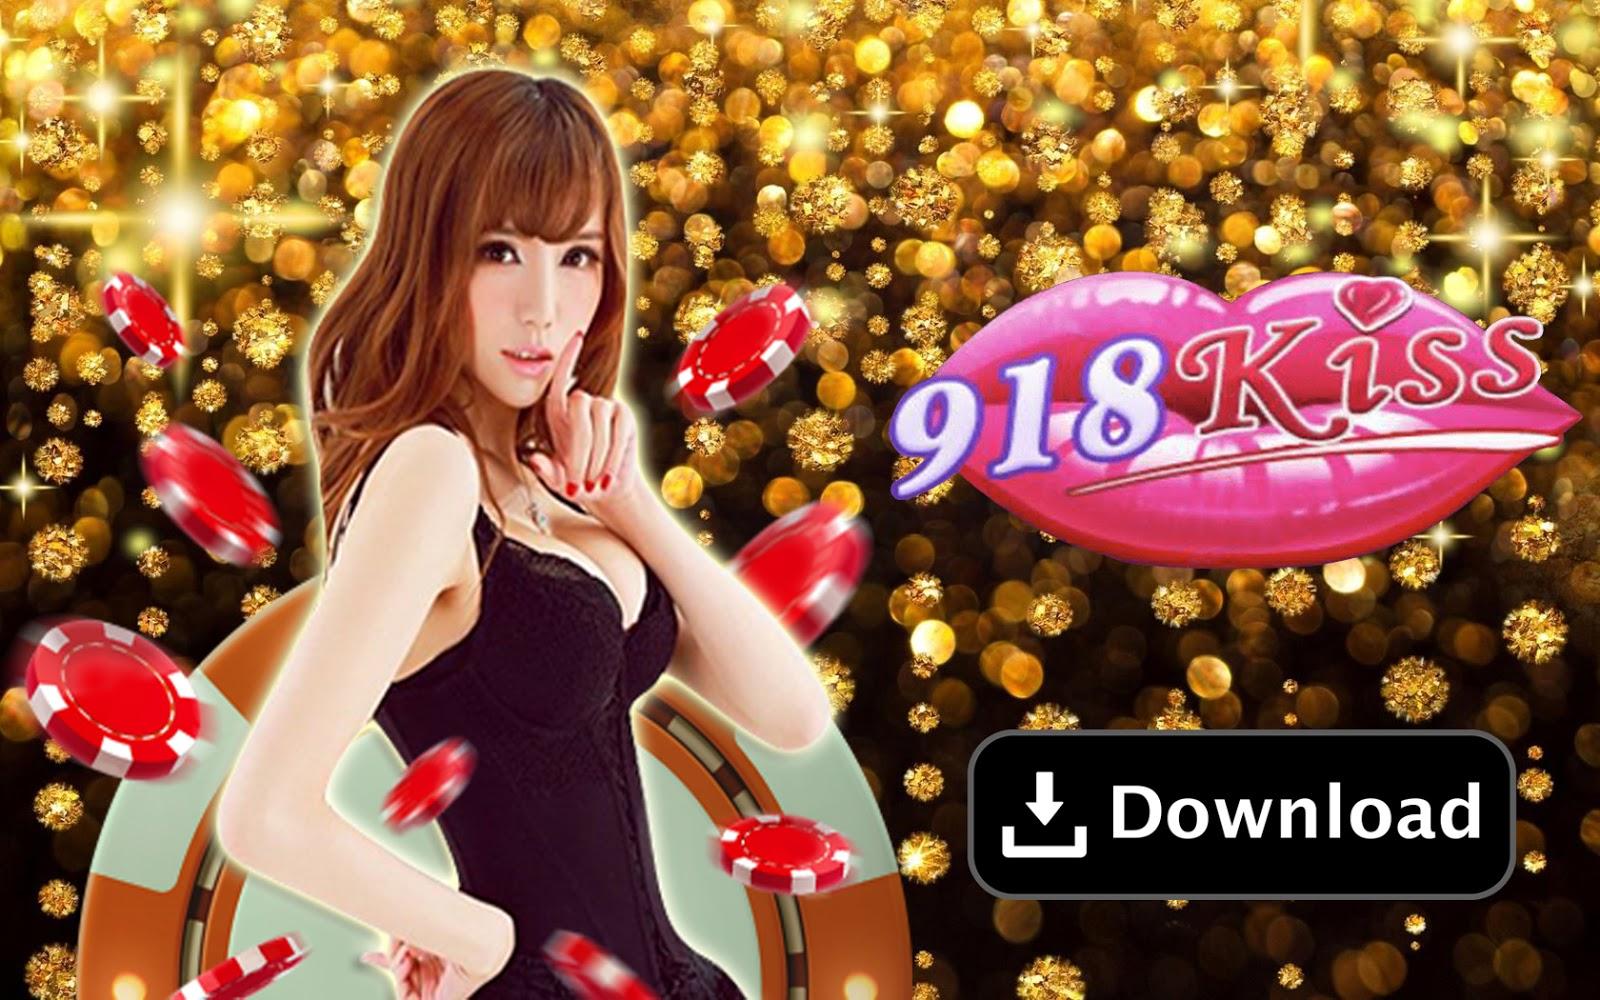 scr888 918kiss hack download